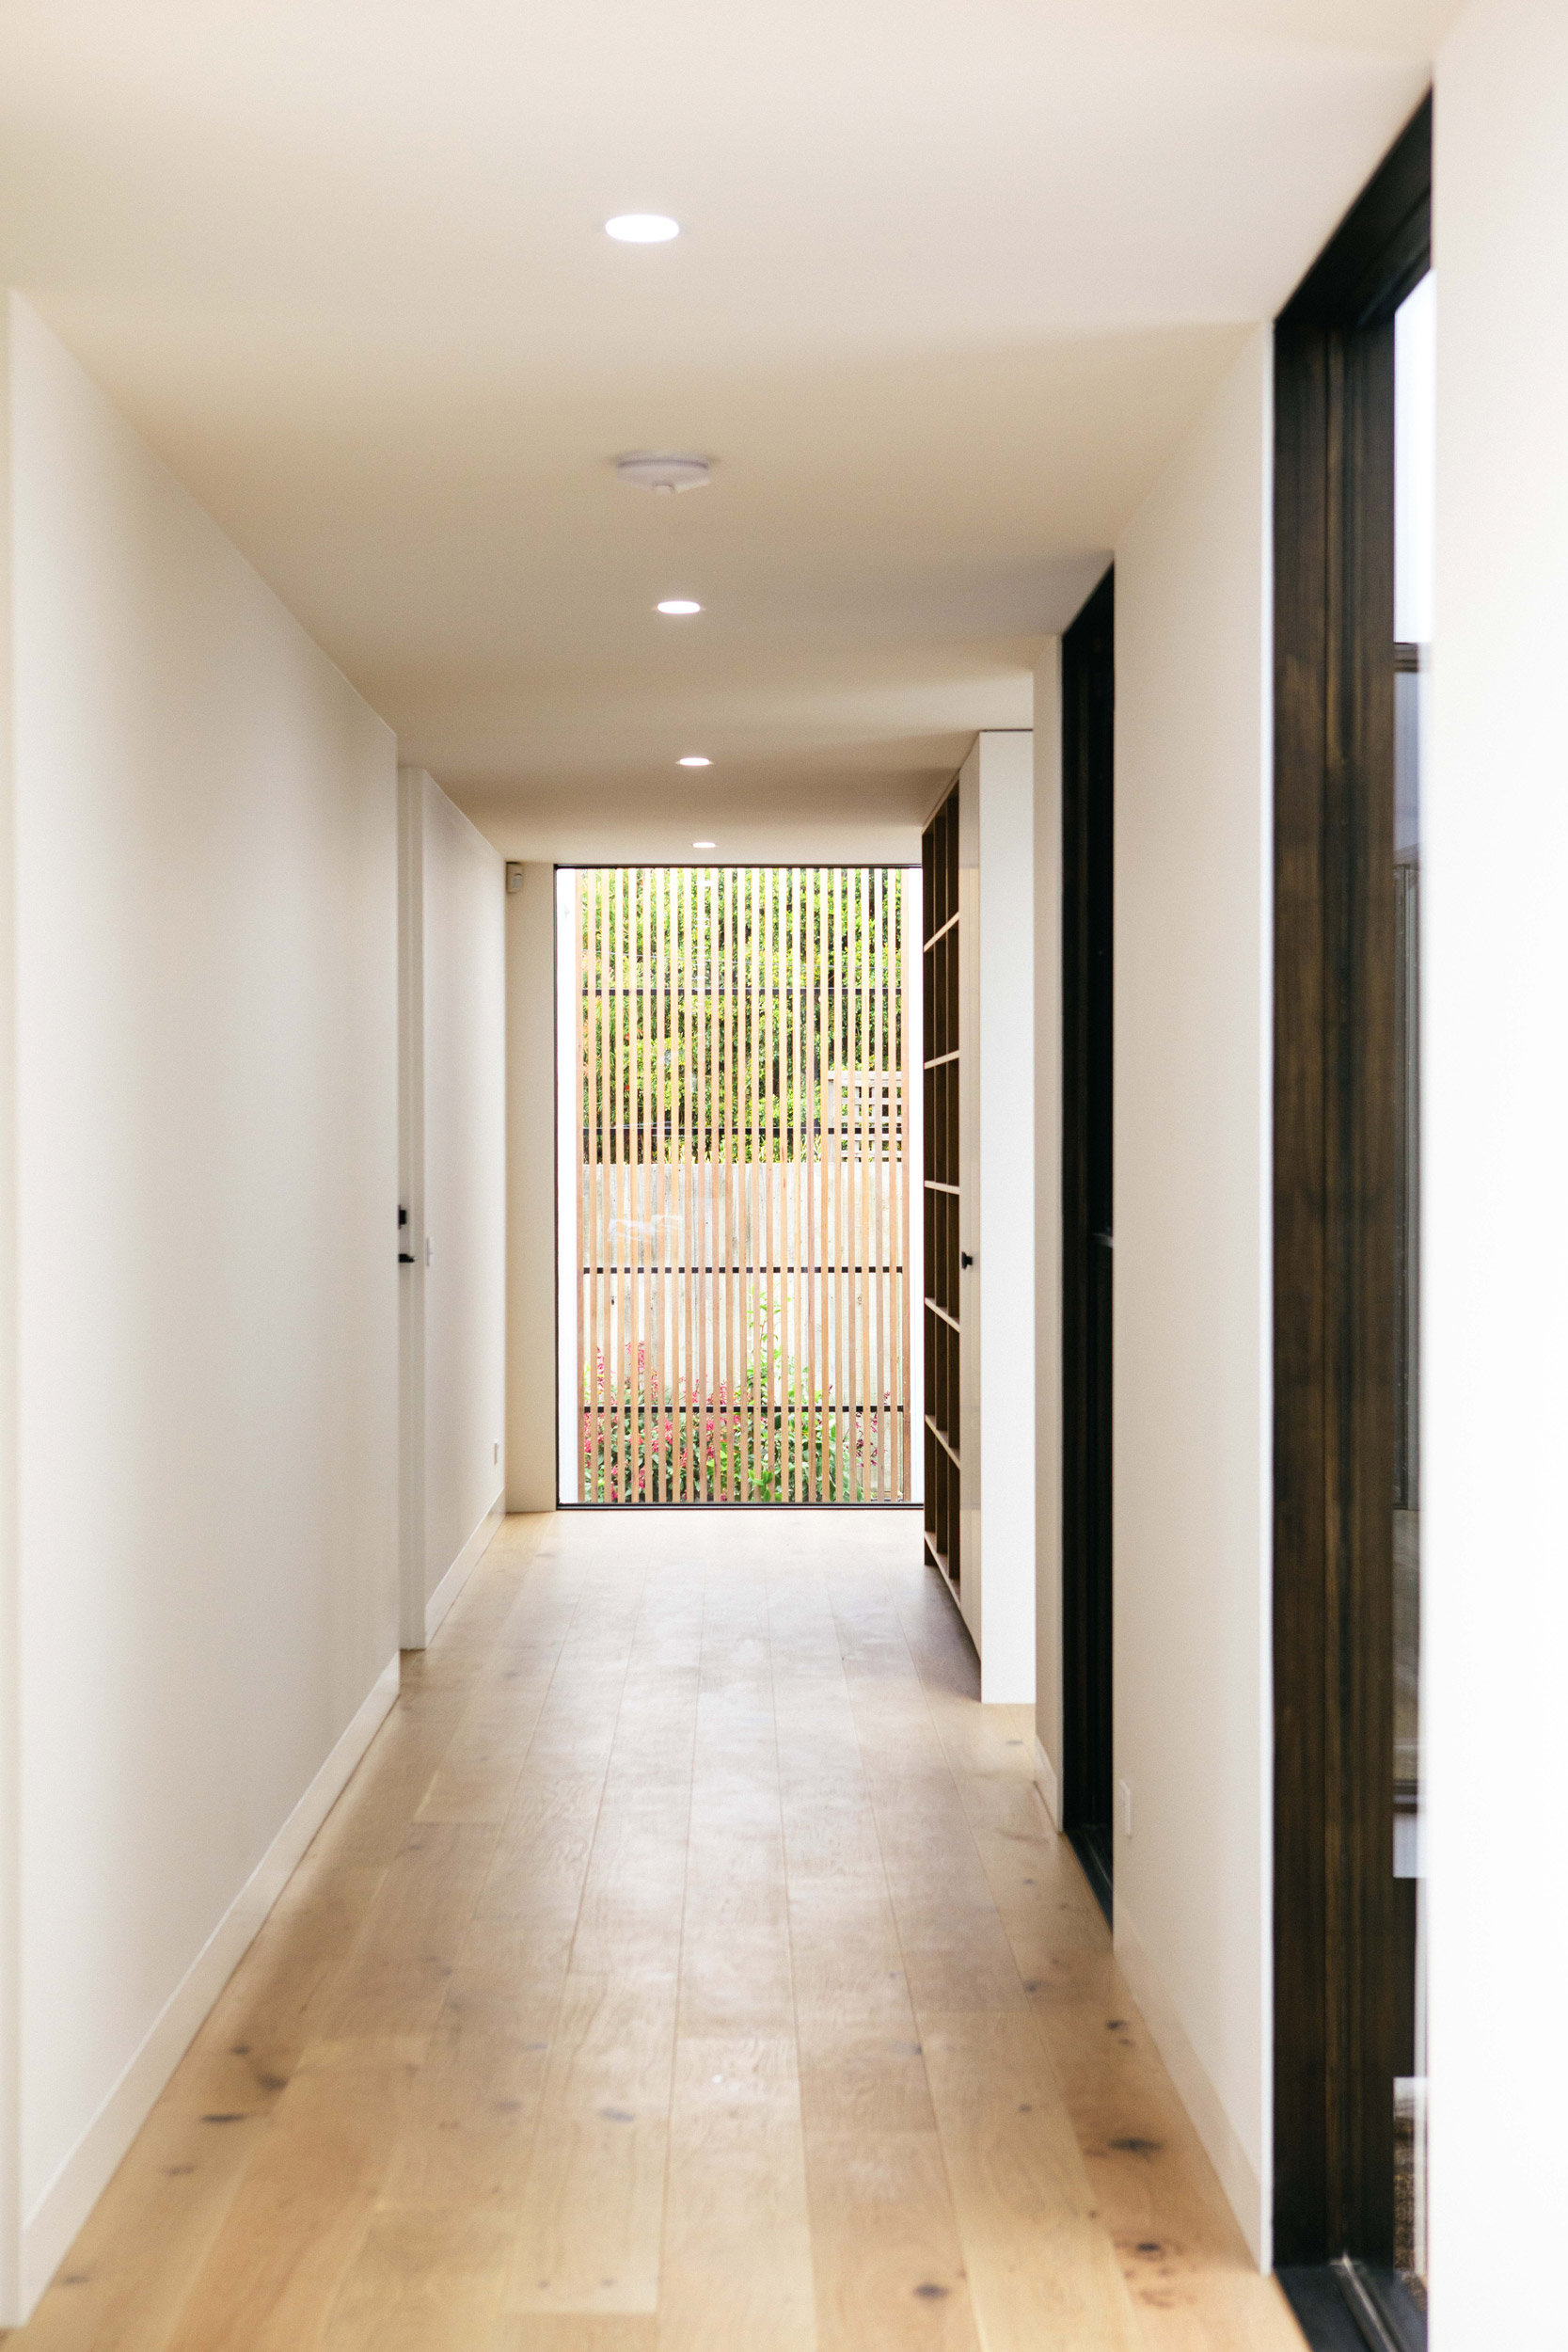 LIFESPACESGROUP_scandi_house_hallway2.jpg